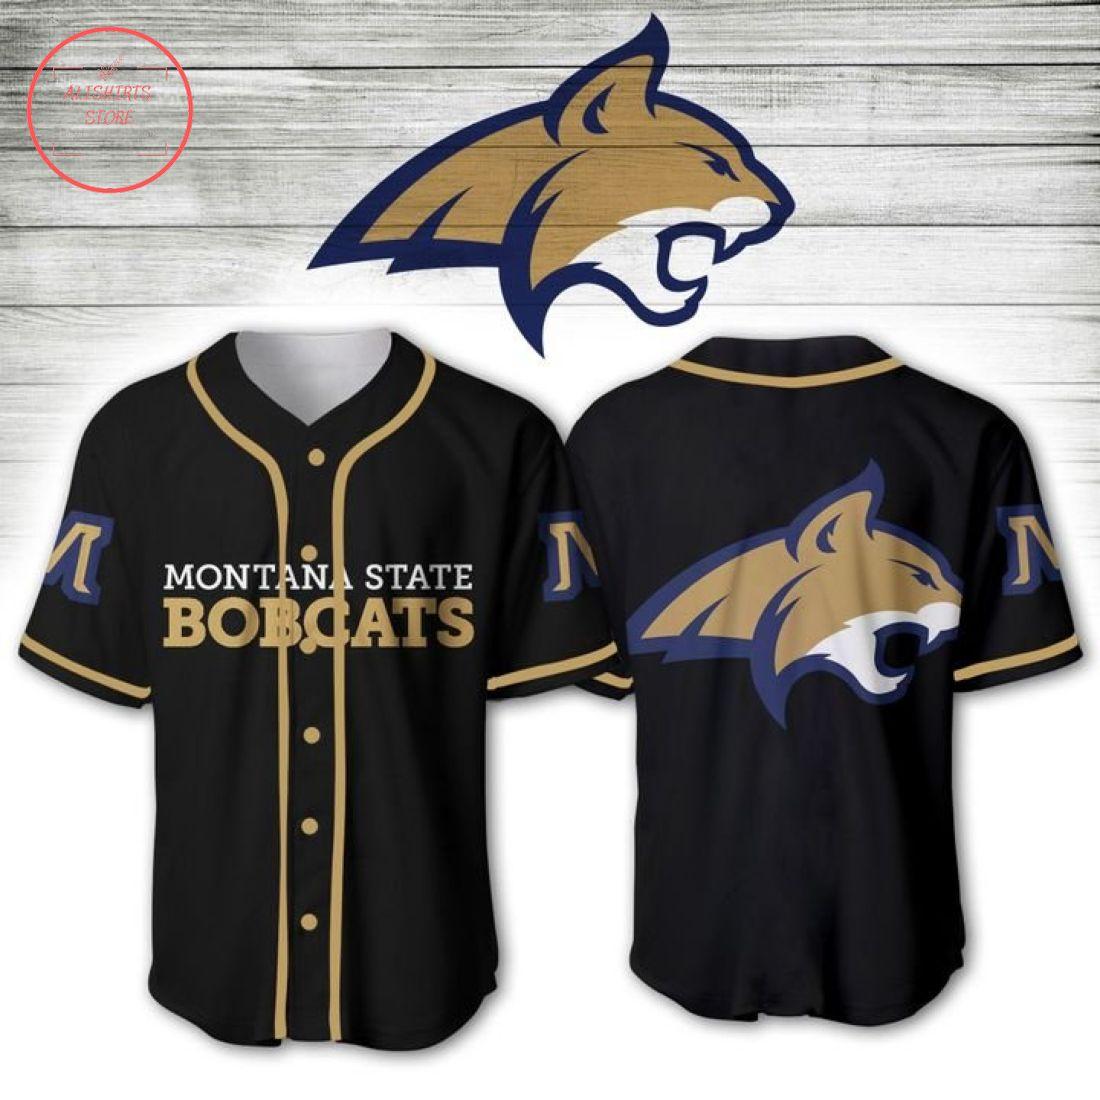 Montana State Bobcats NCAA Baseball Jersey